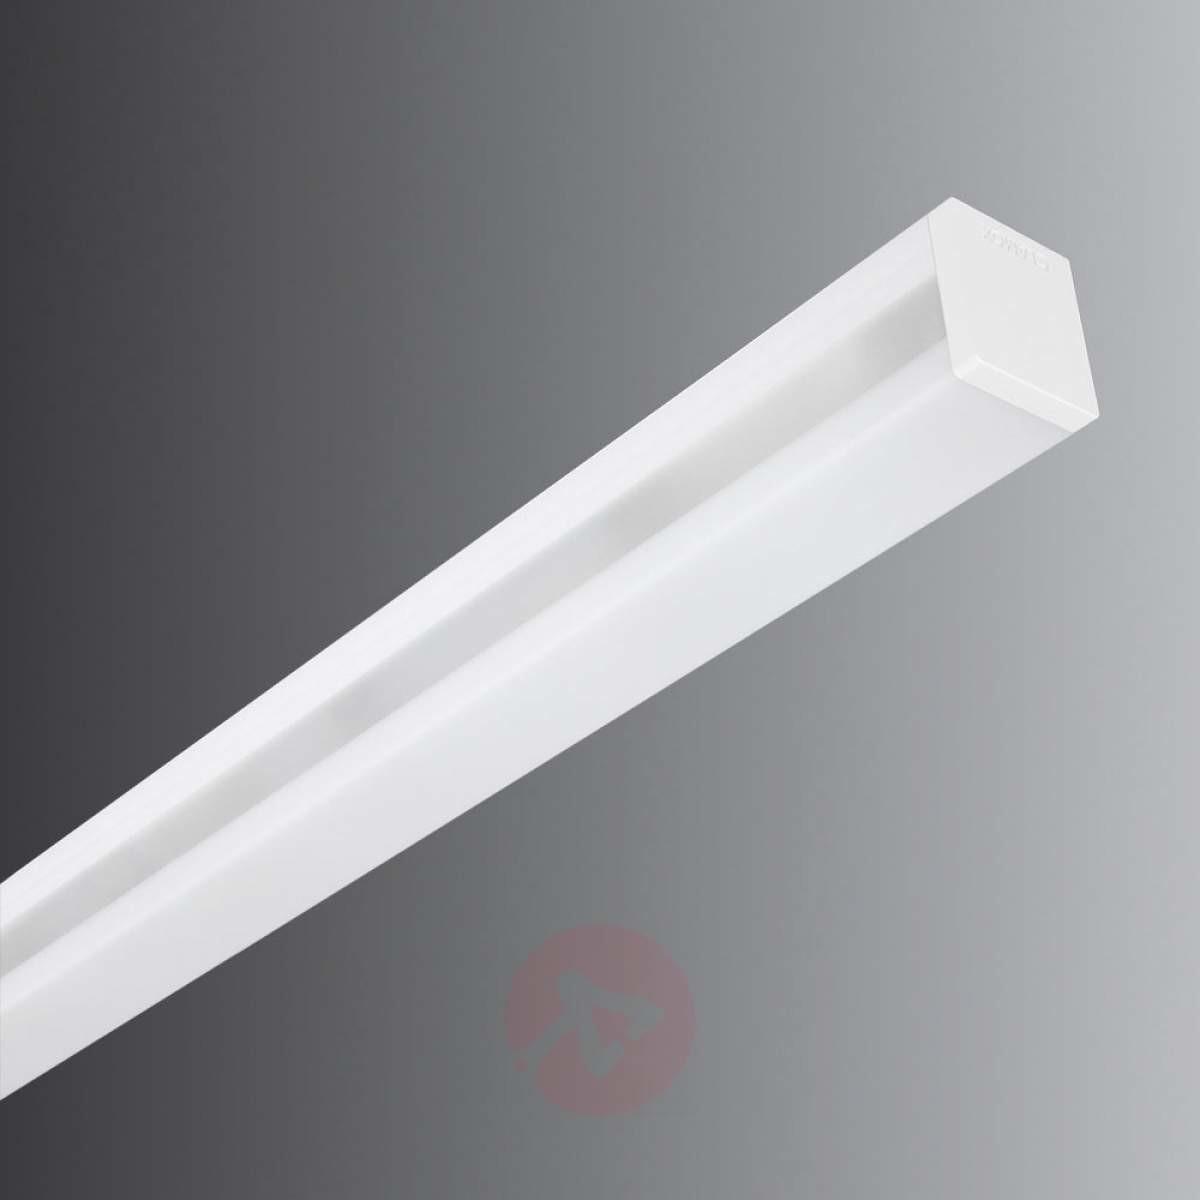 Luxo Lampa LED 16W A40-W1200 2100HF 120cm 3000